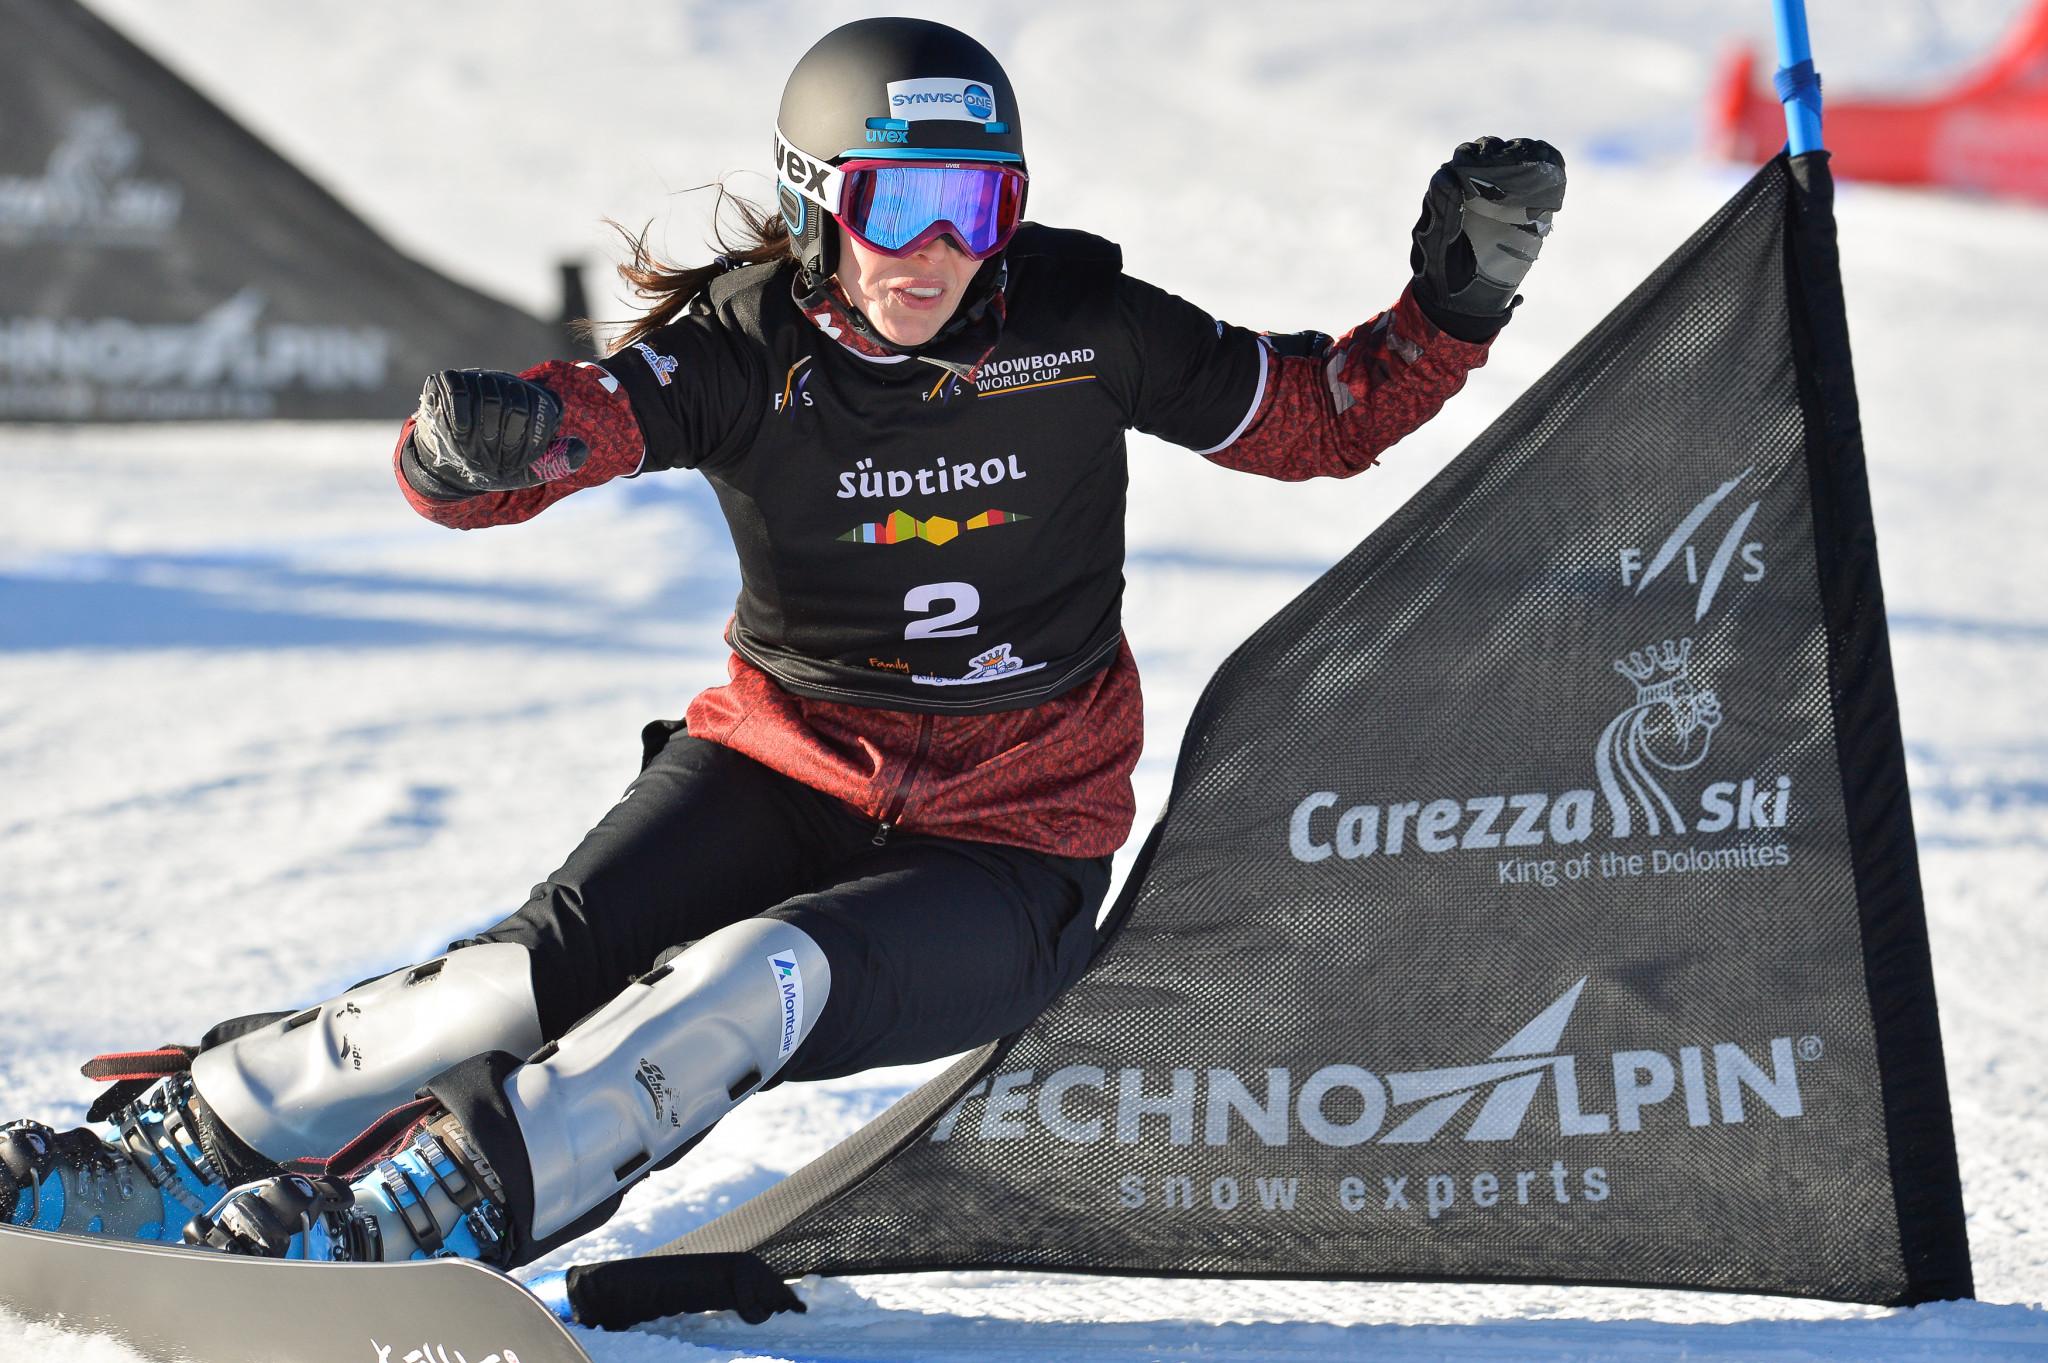 Carezza primed for season opener of FIS Alpine Snowboard World Cup